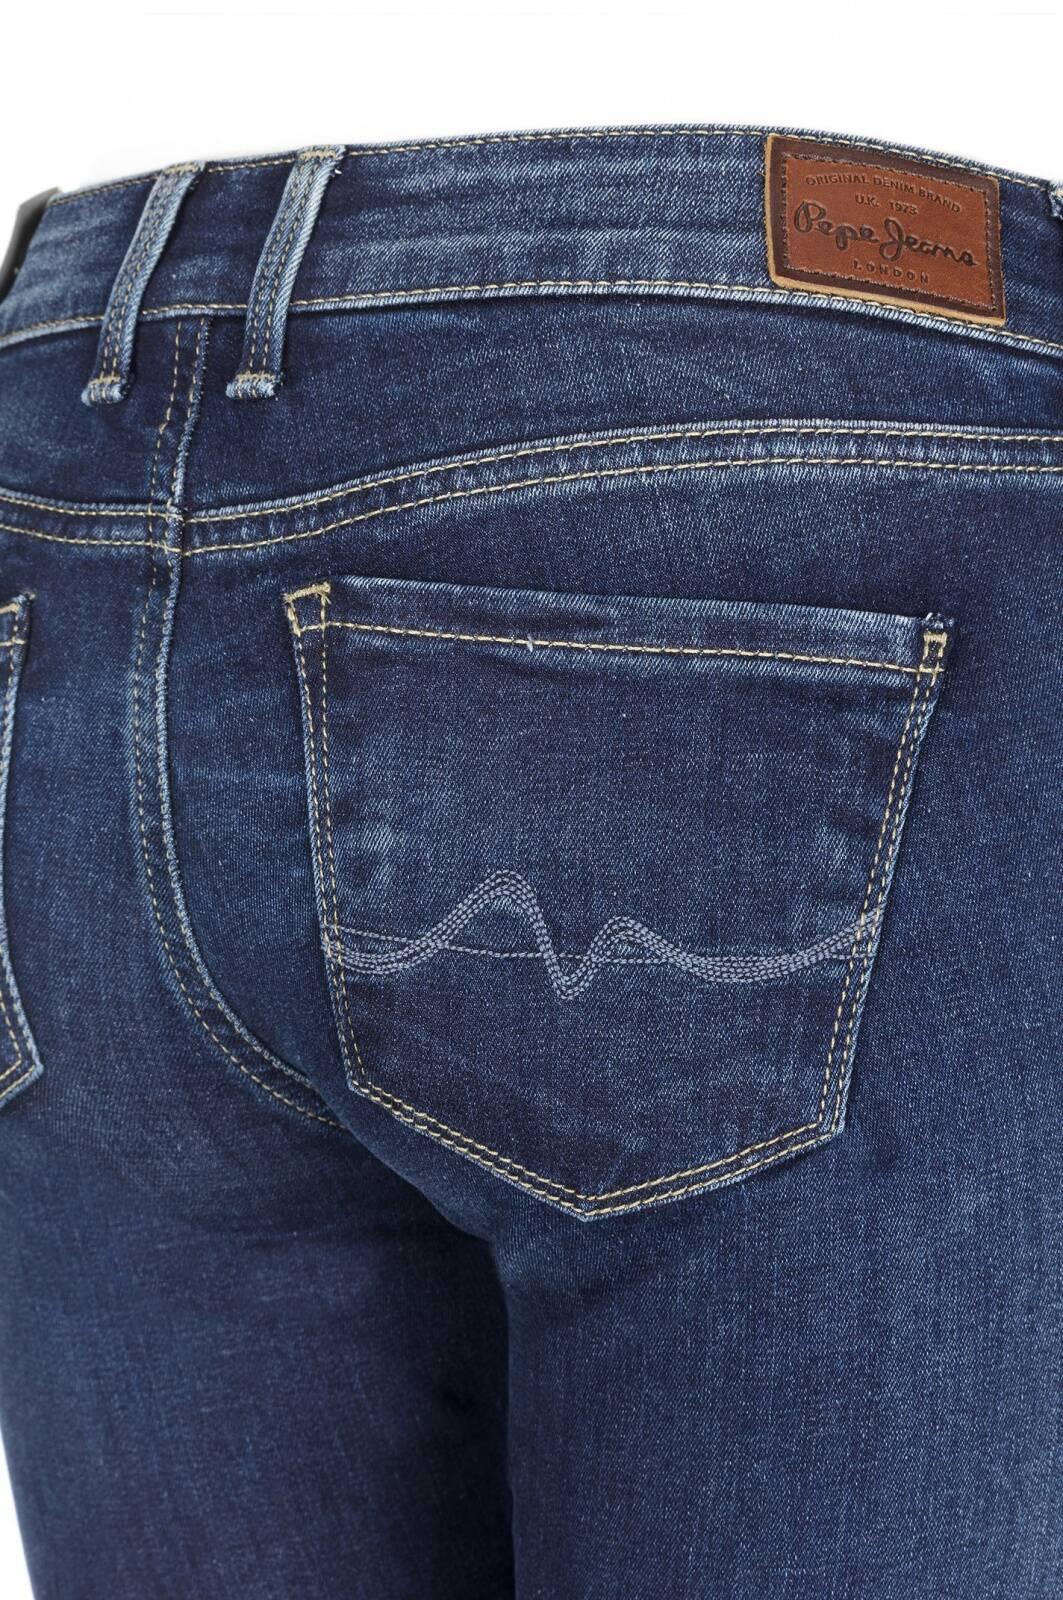 soho jeans pepe jeans london blue jeans pants. Black Bedroom Furniture Sets. Home Design Ideas